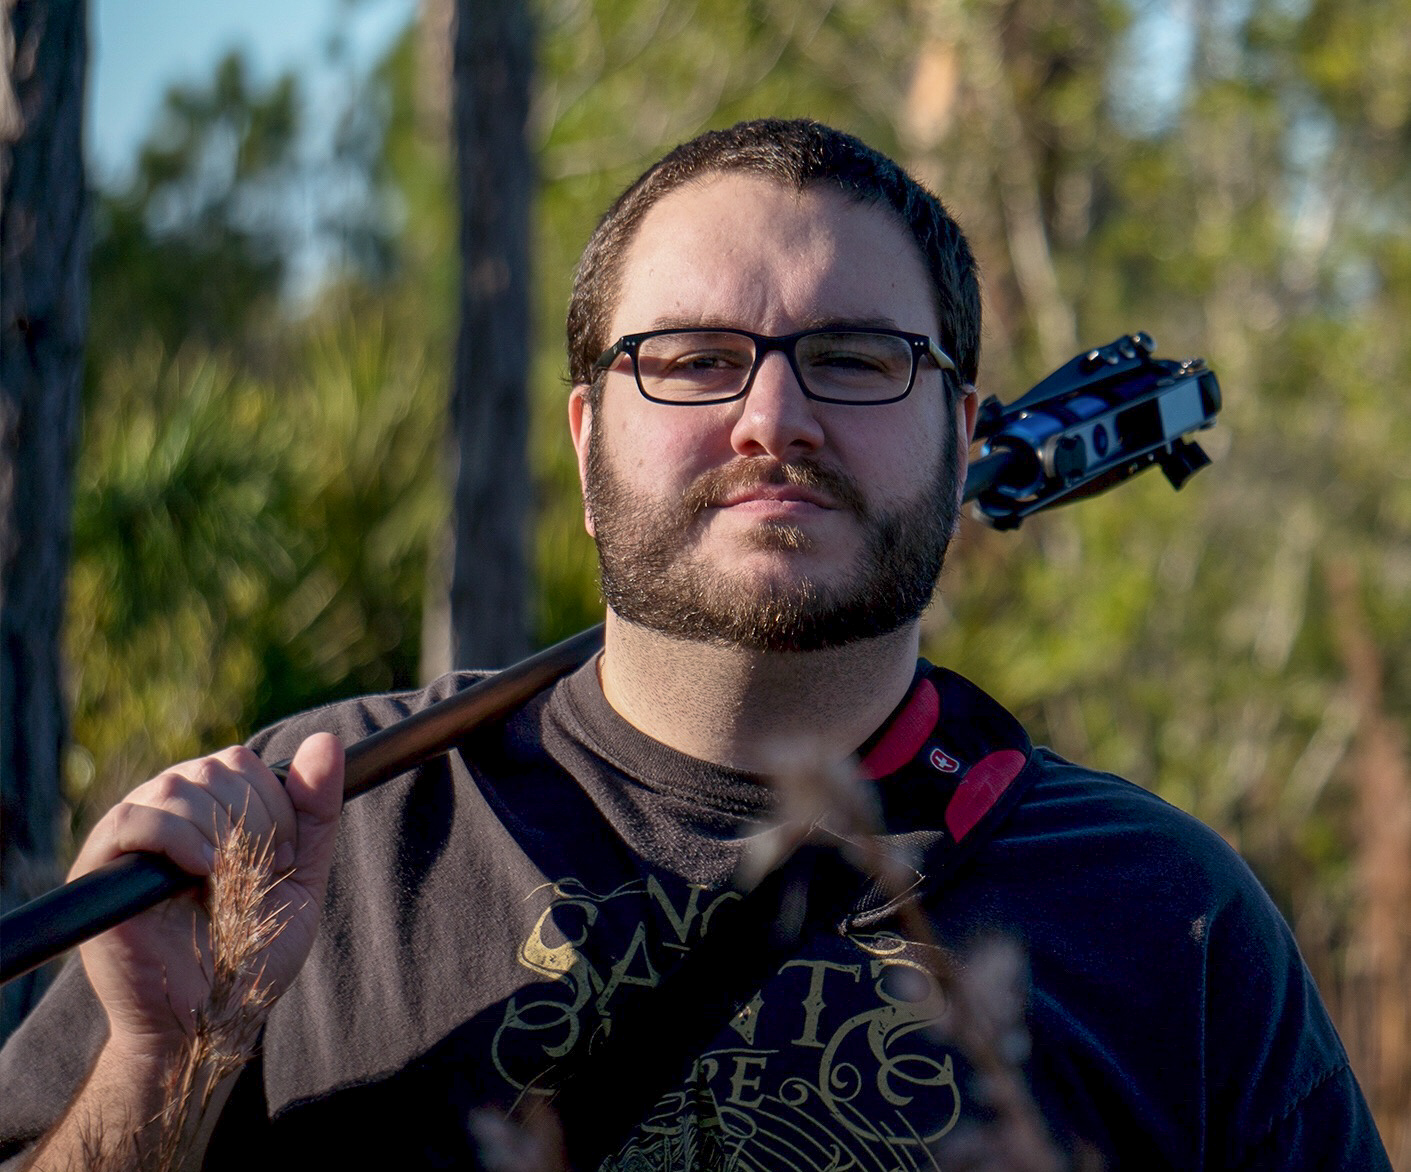 Nate Paruch - Owner of Blue Hammock Studios/Sound Engineer/Filmmaker